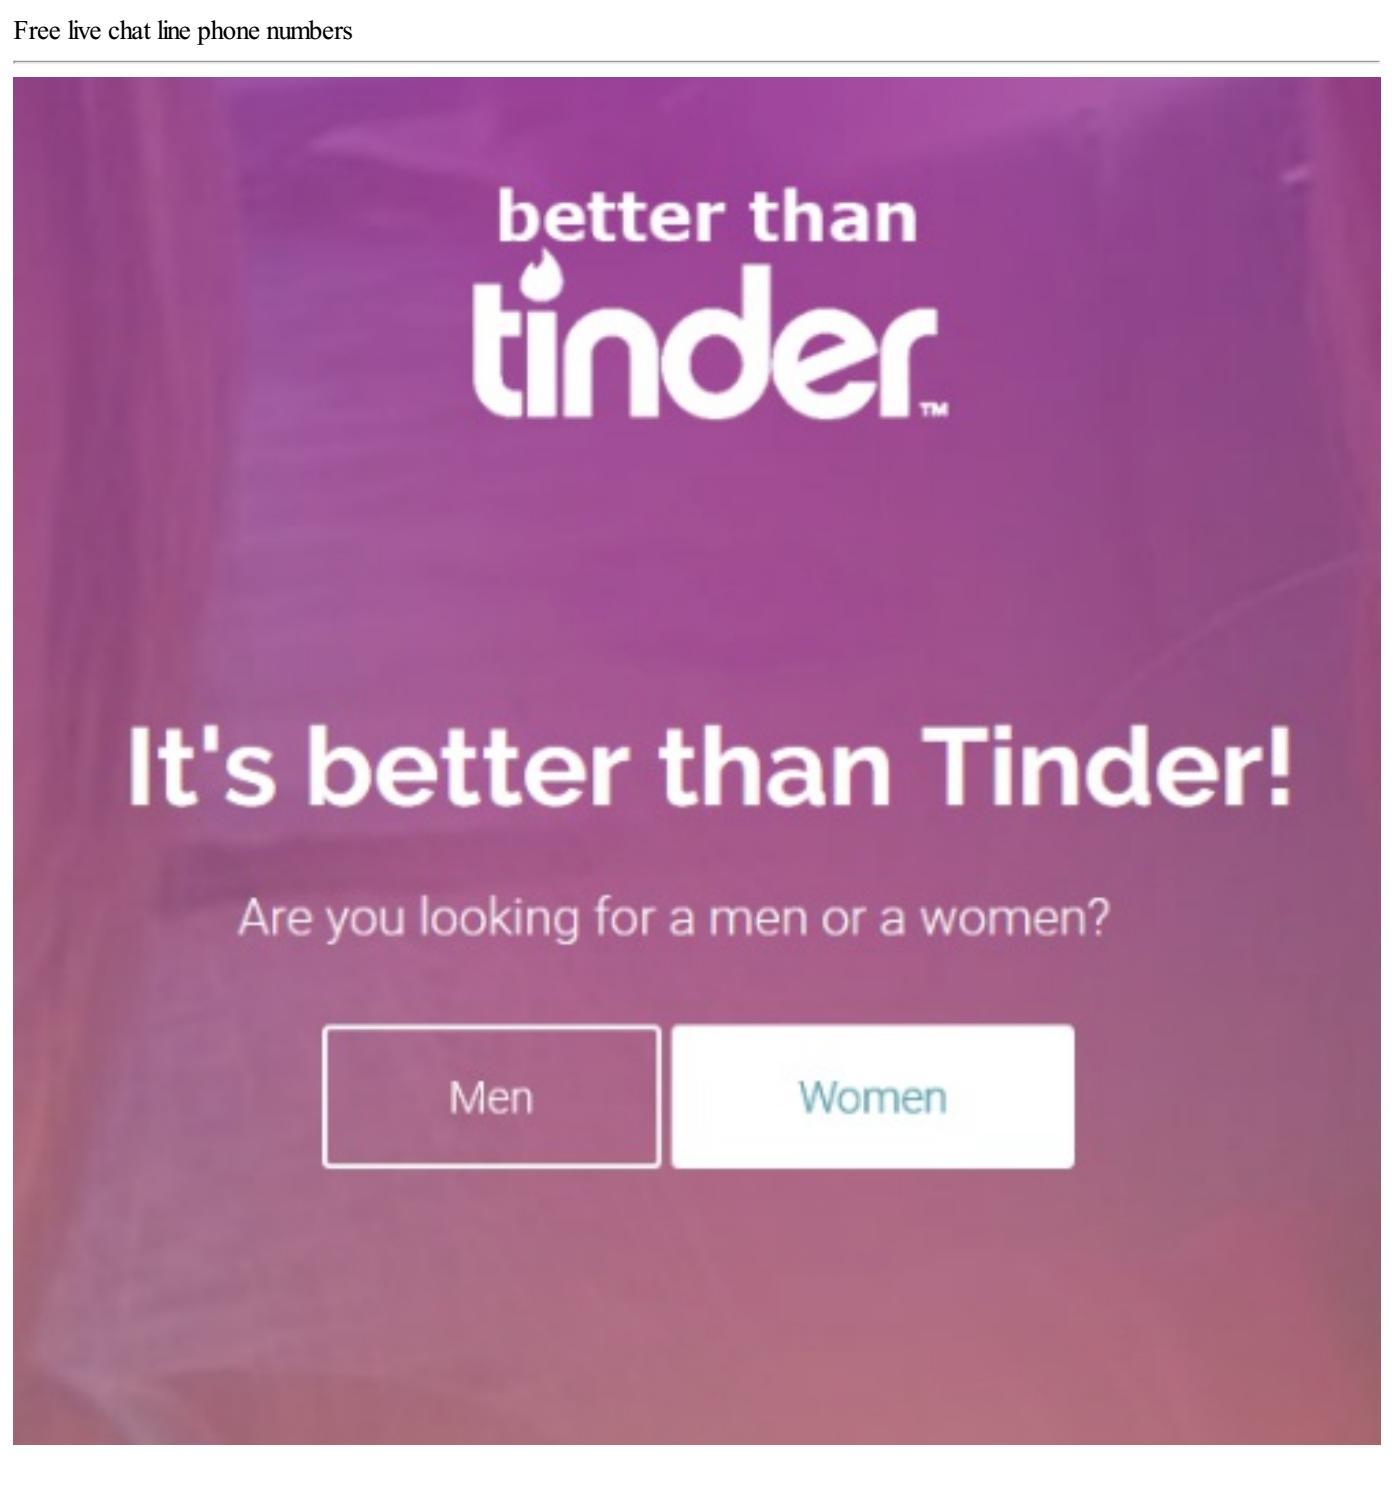 women chat line